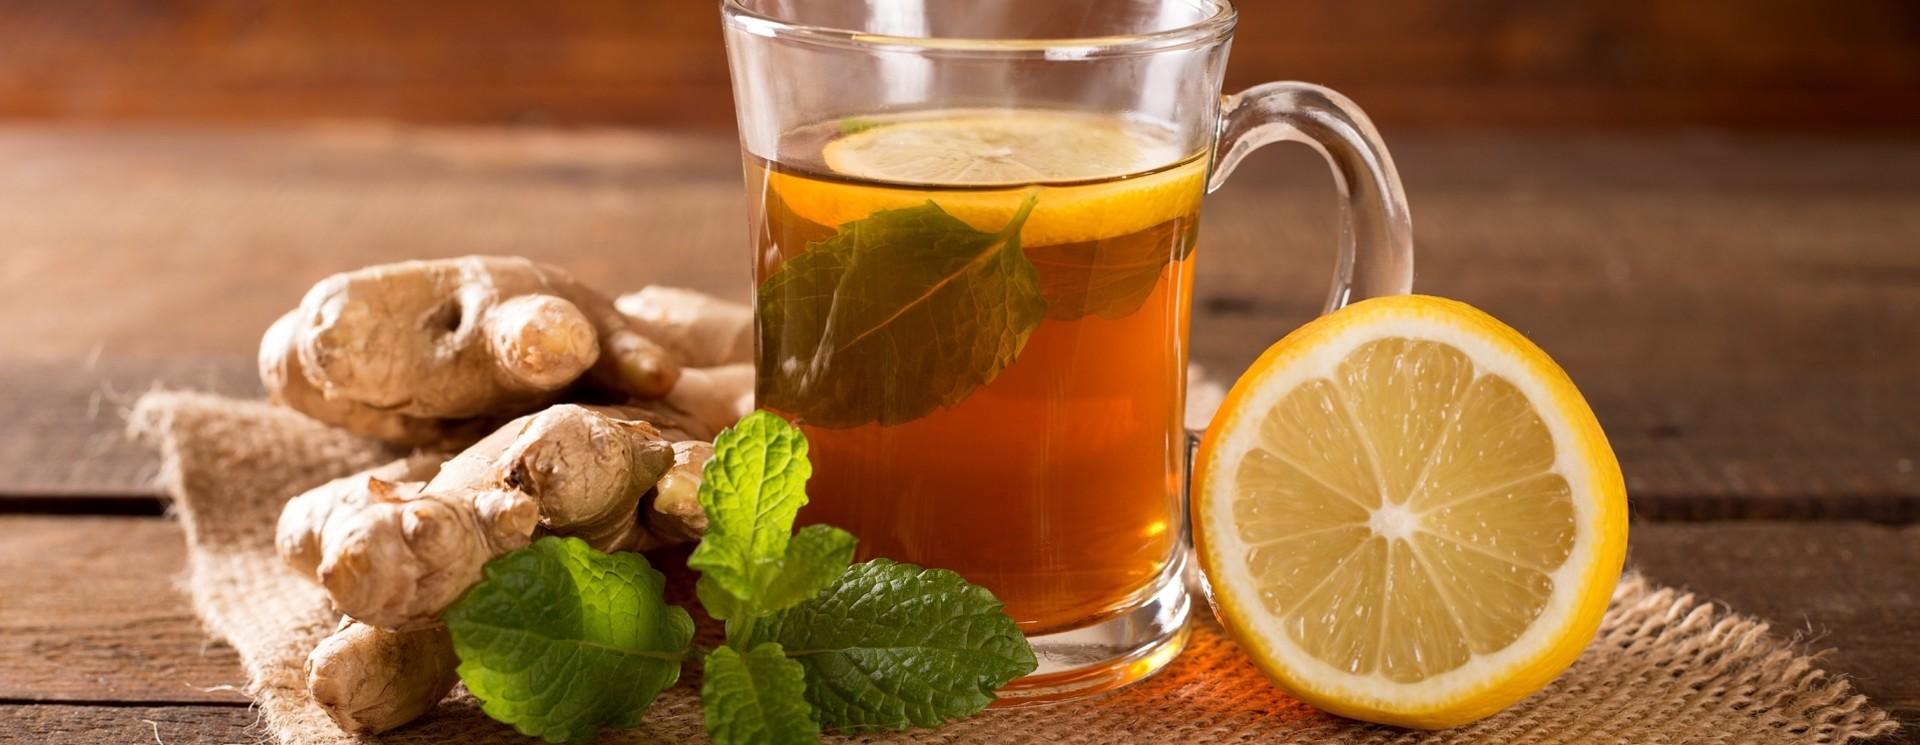 Thé blanc aromatisé